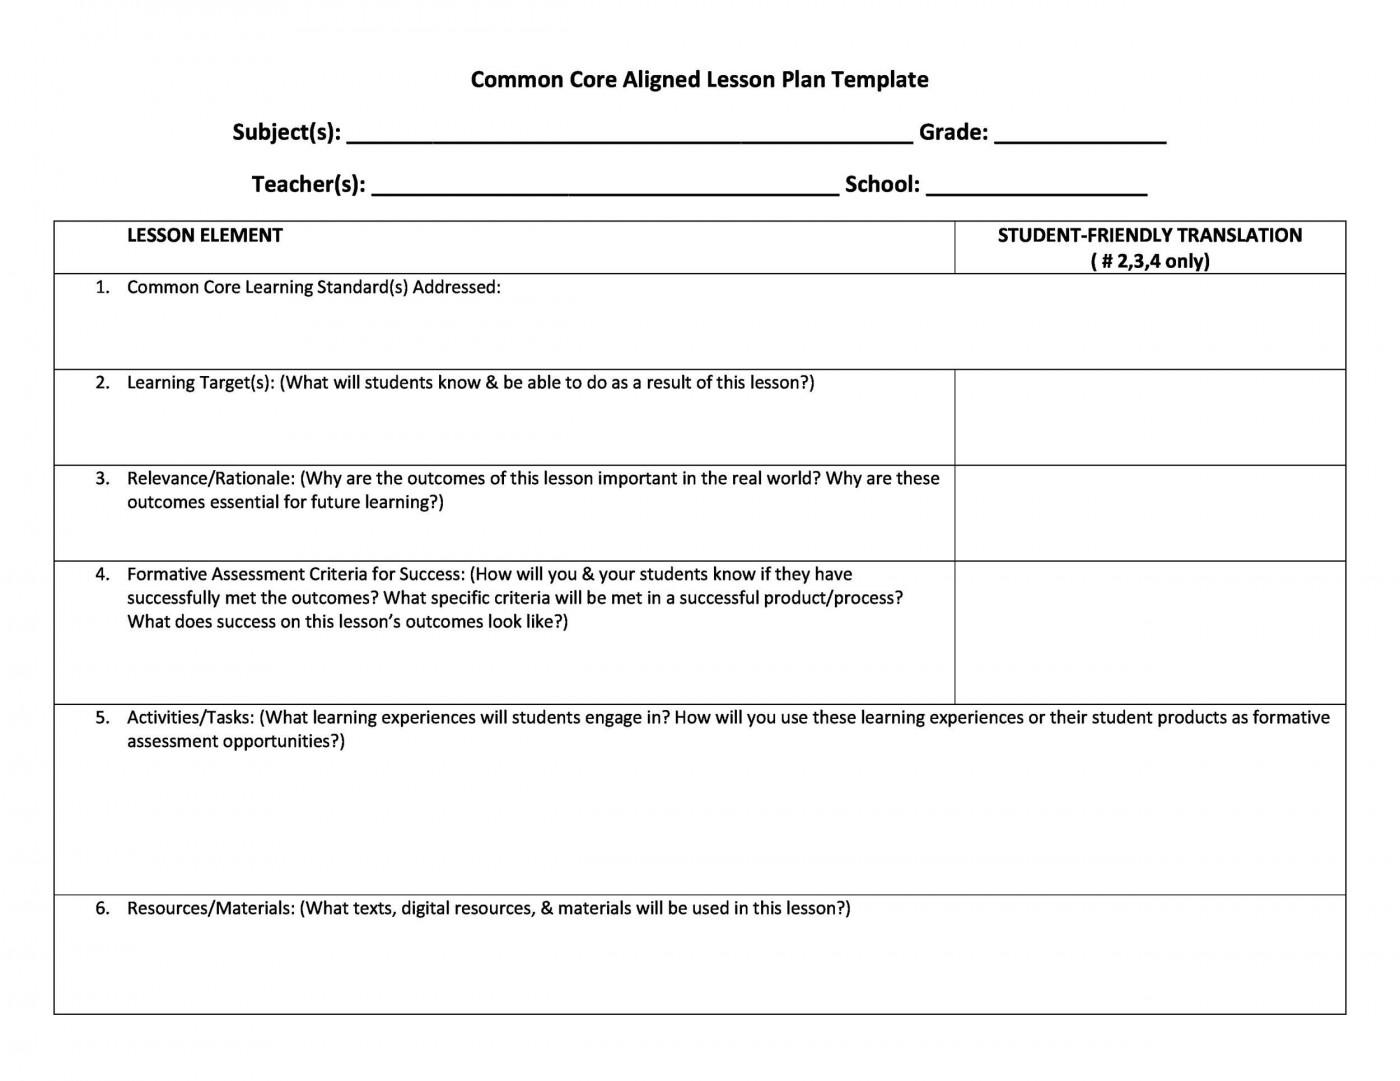 008 Astounding Lesson Plan Template For Kindergarten Common Core Example 1400